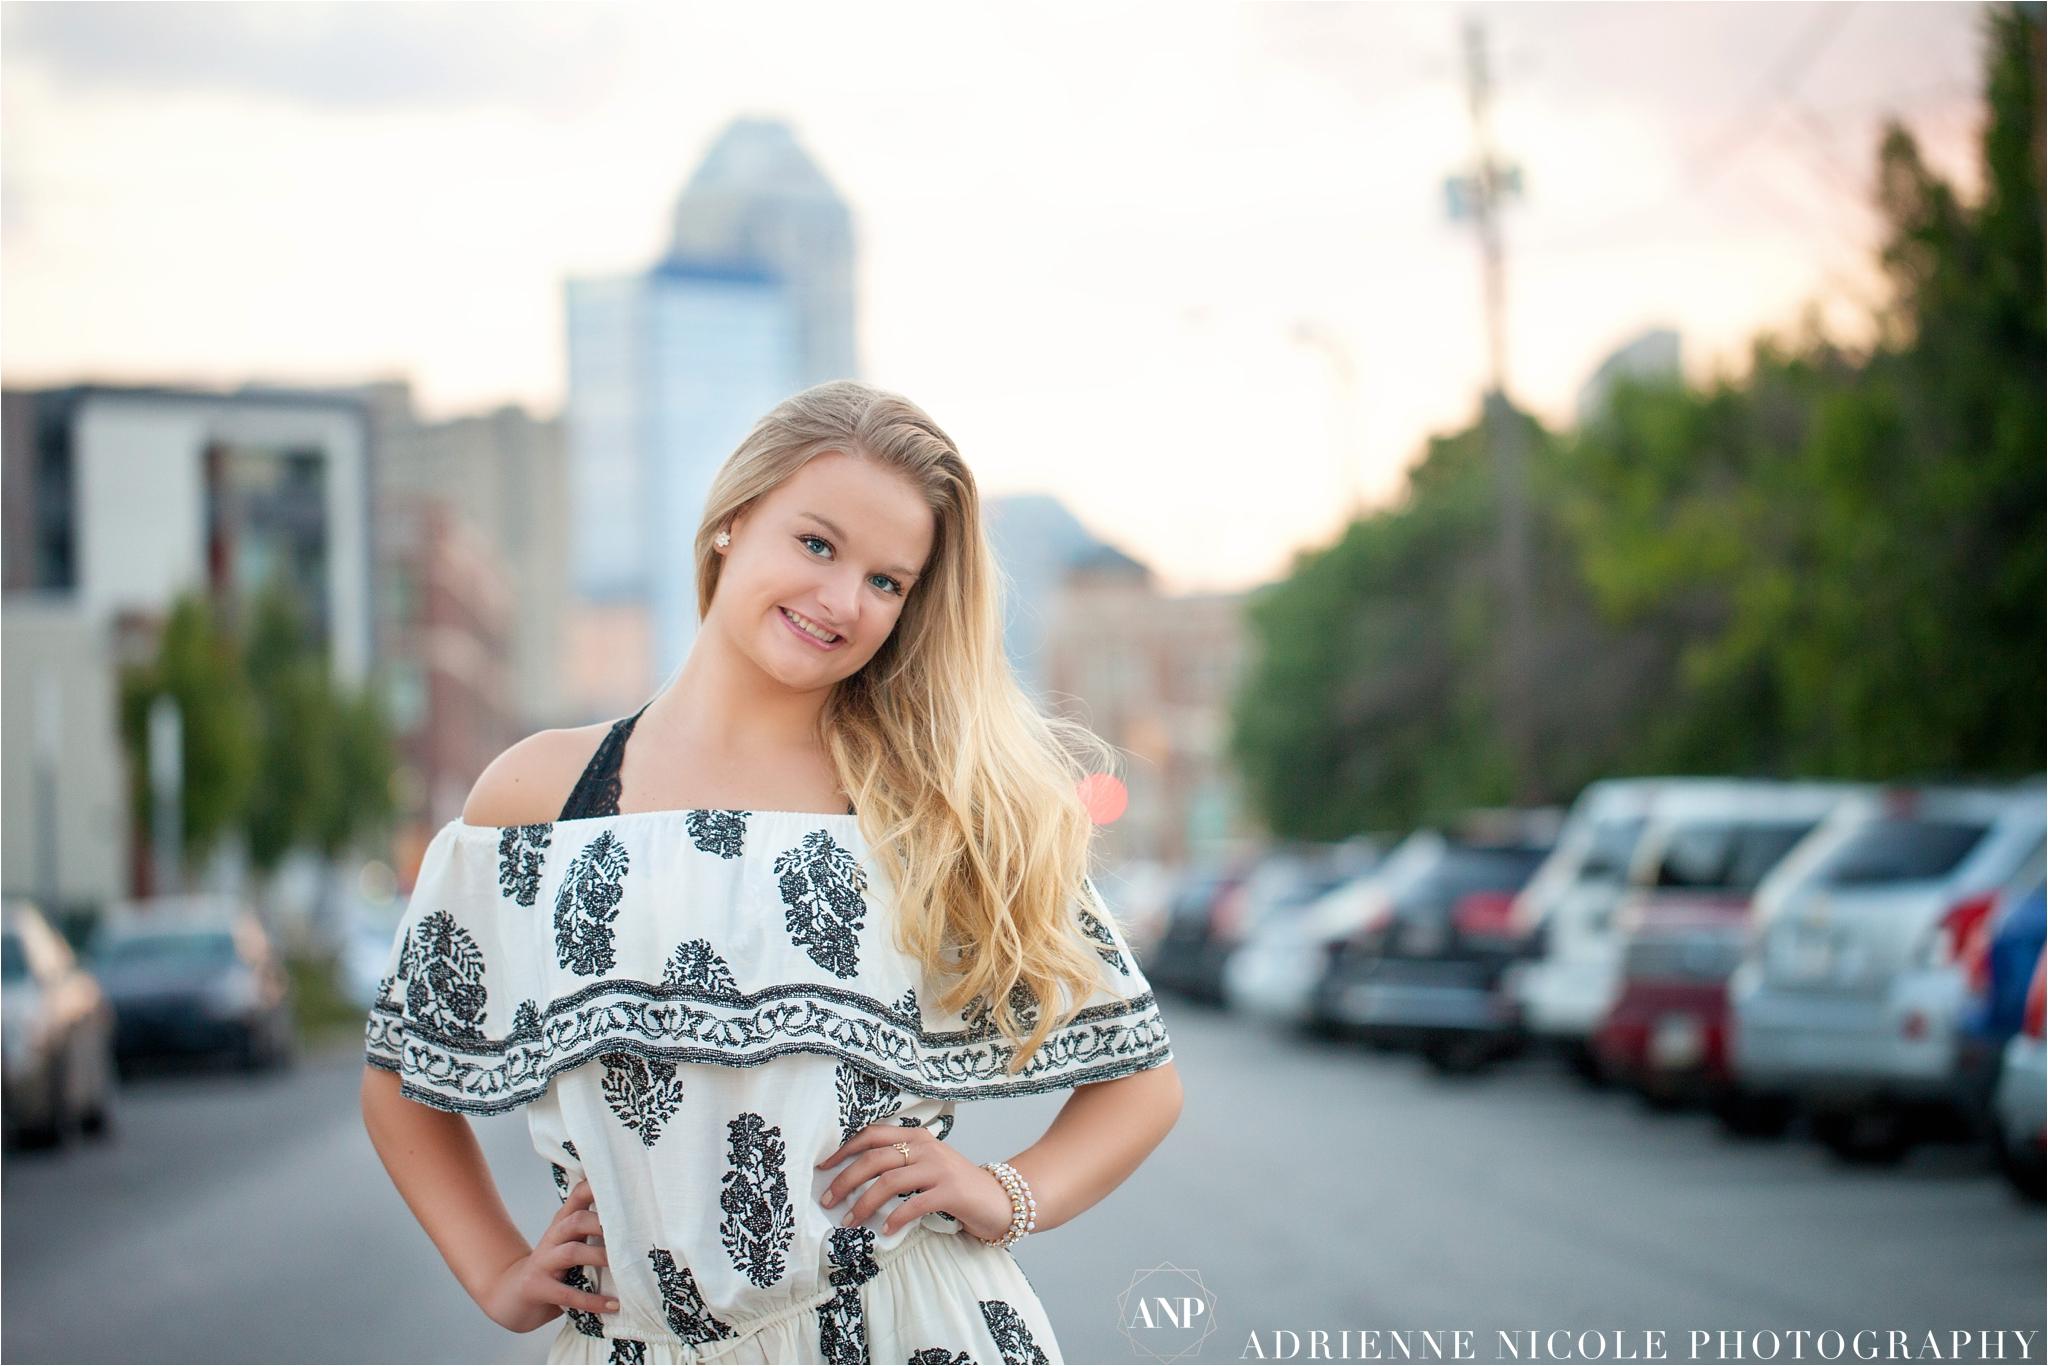 Adrienne Nicole Photography_IndianaSeniorPhotographer_Avon_1424.jpg